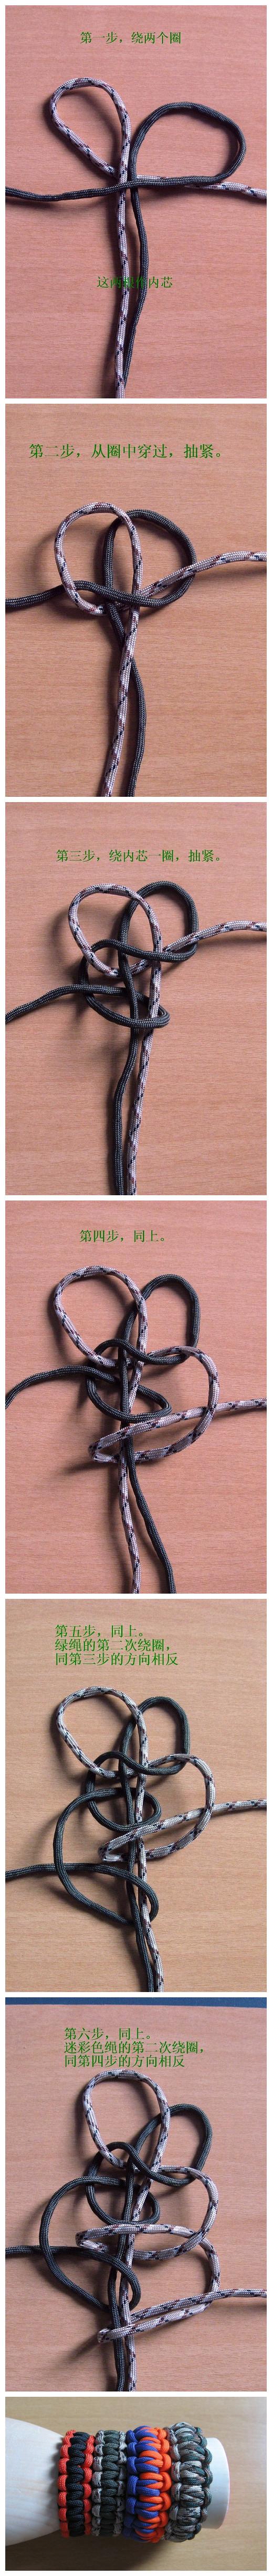 一款超酷的手工手链编织方法图解_来自ibyr的图片分享>>>what the...??? i'm happy there's pictures(: